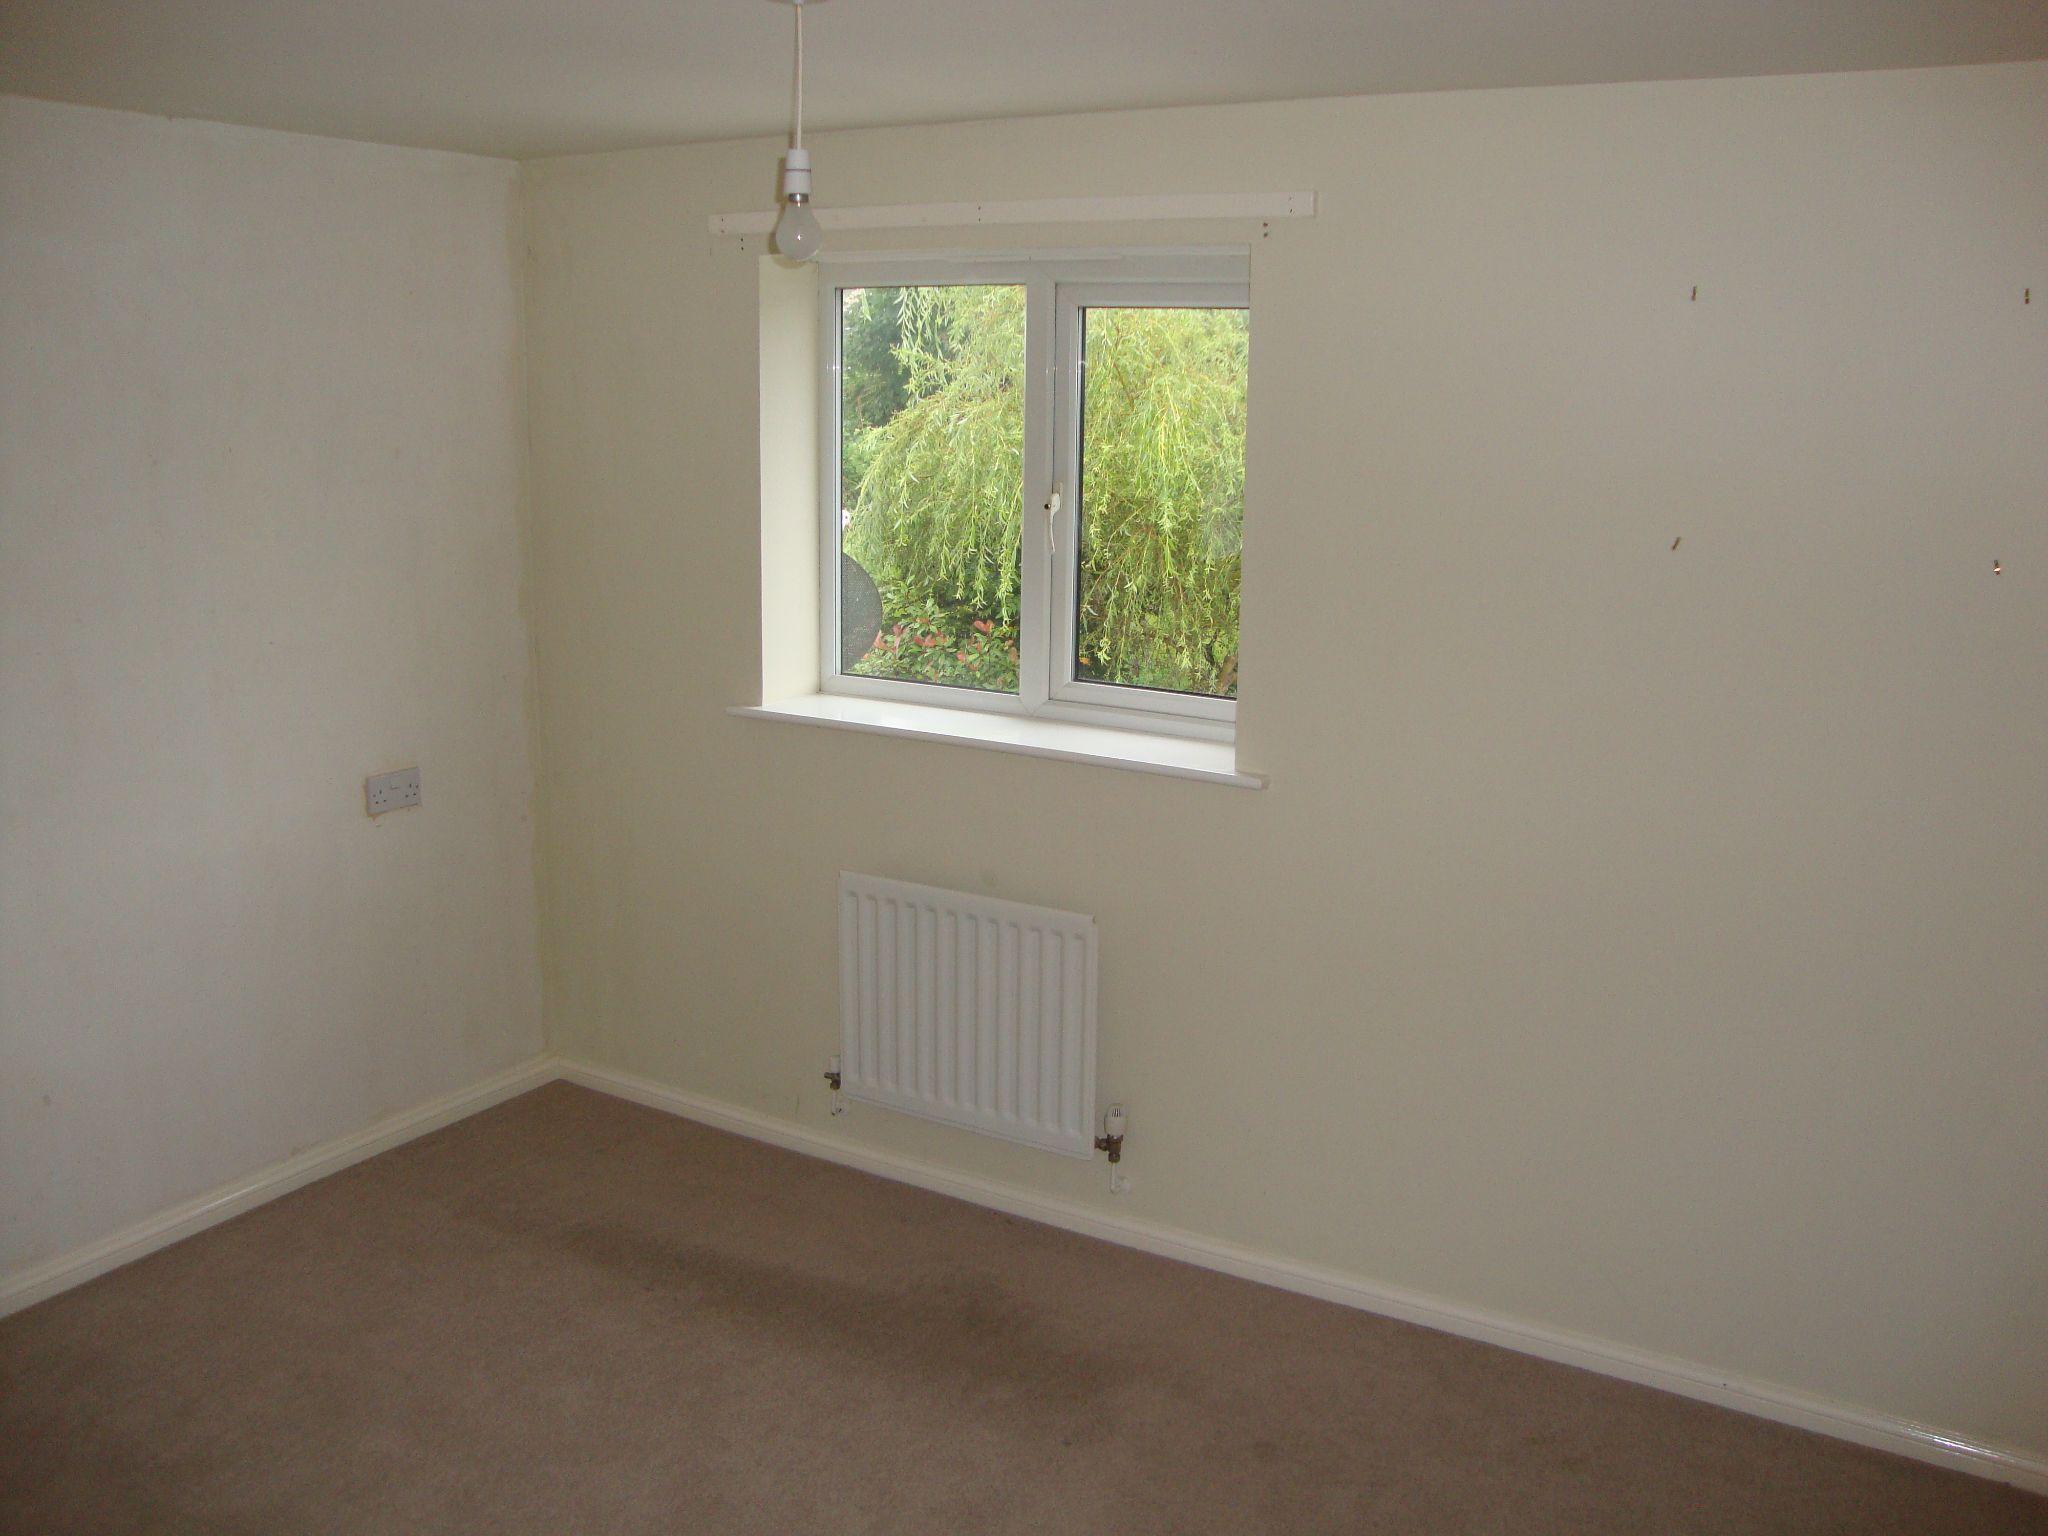 4 bedroom detached house For Sale in Durham - Bedroom One.